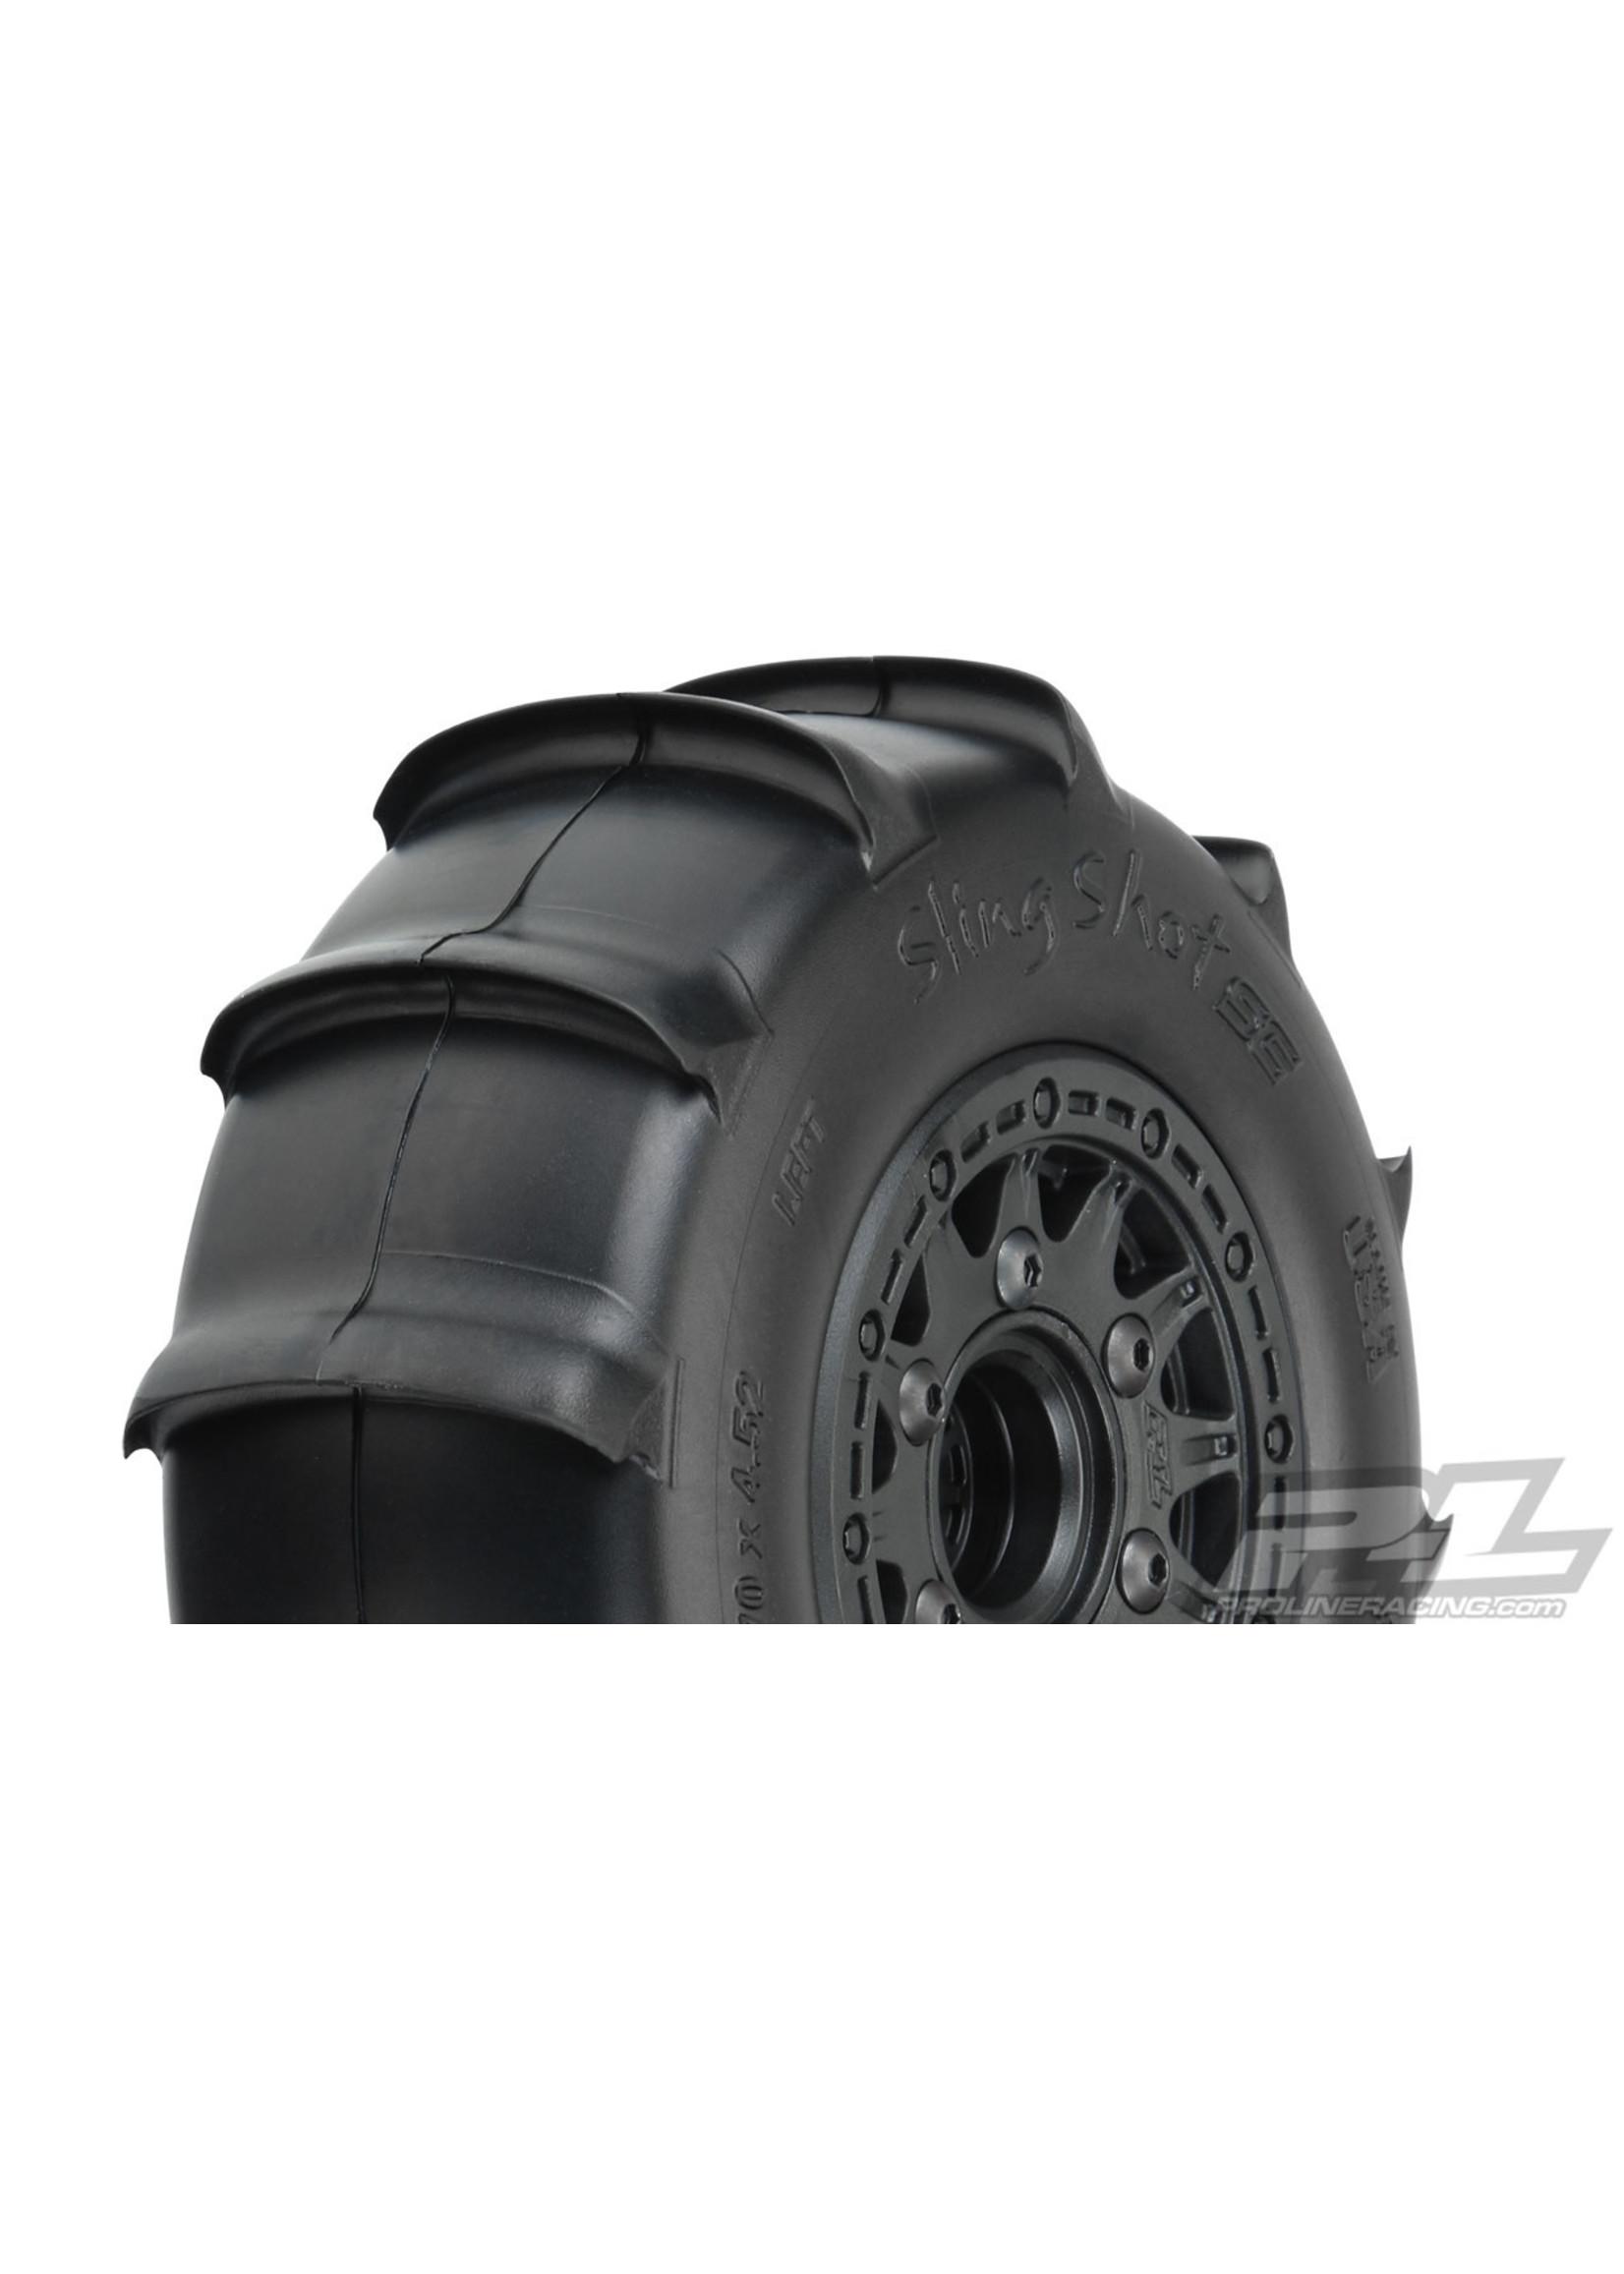 Pro-Line Racing PRO1158-10 Pro-Line Sling Shot SC MTD Raid 6x30 Slash 2wd/4WD F/R